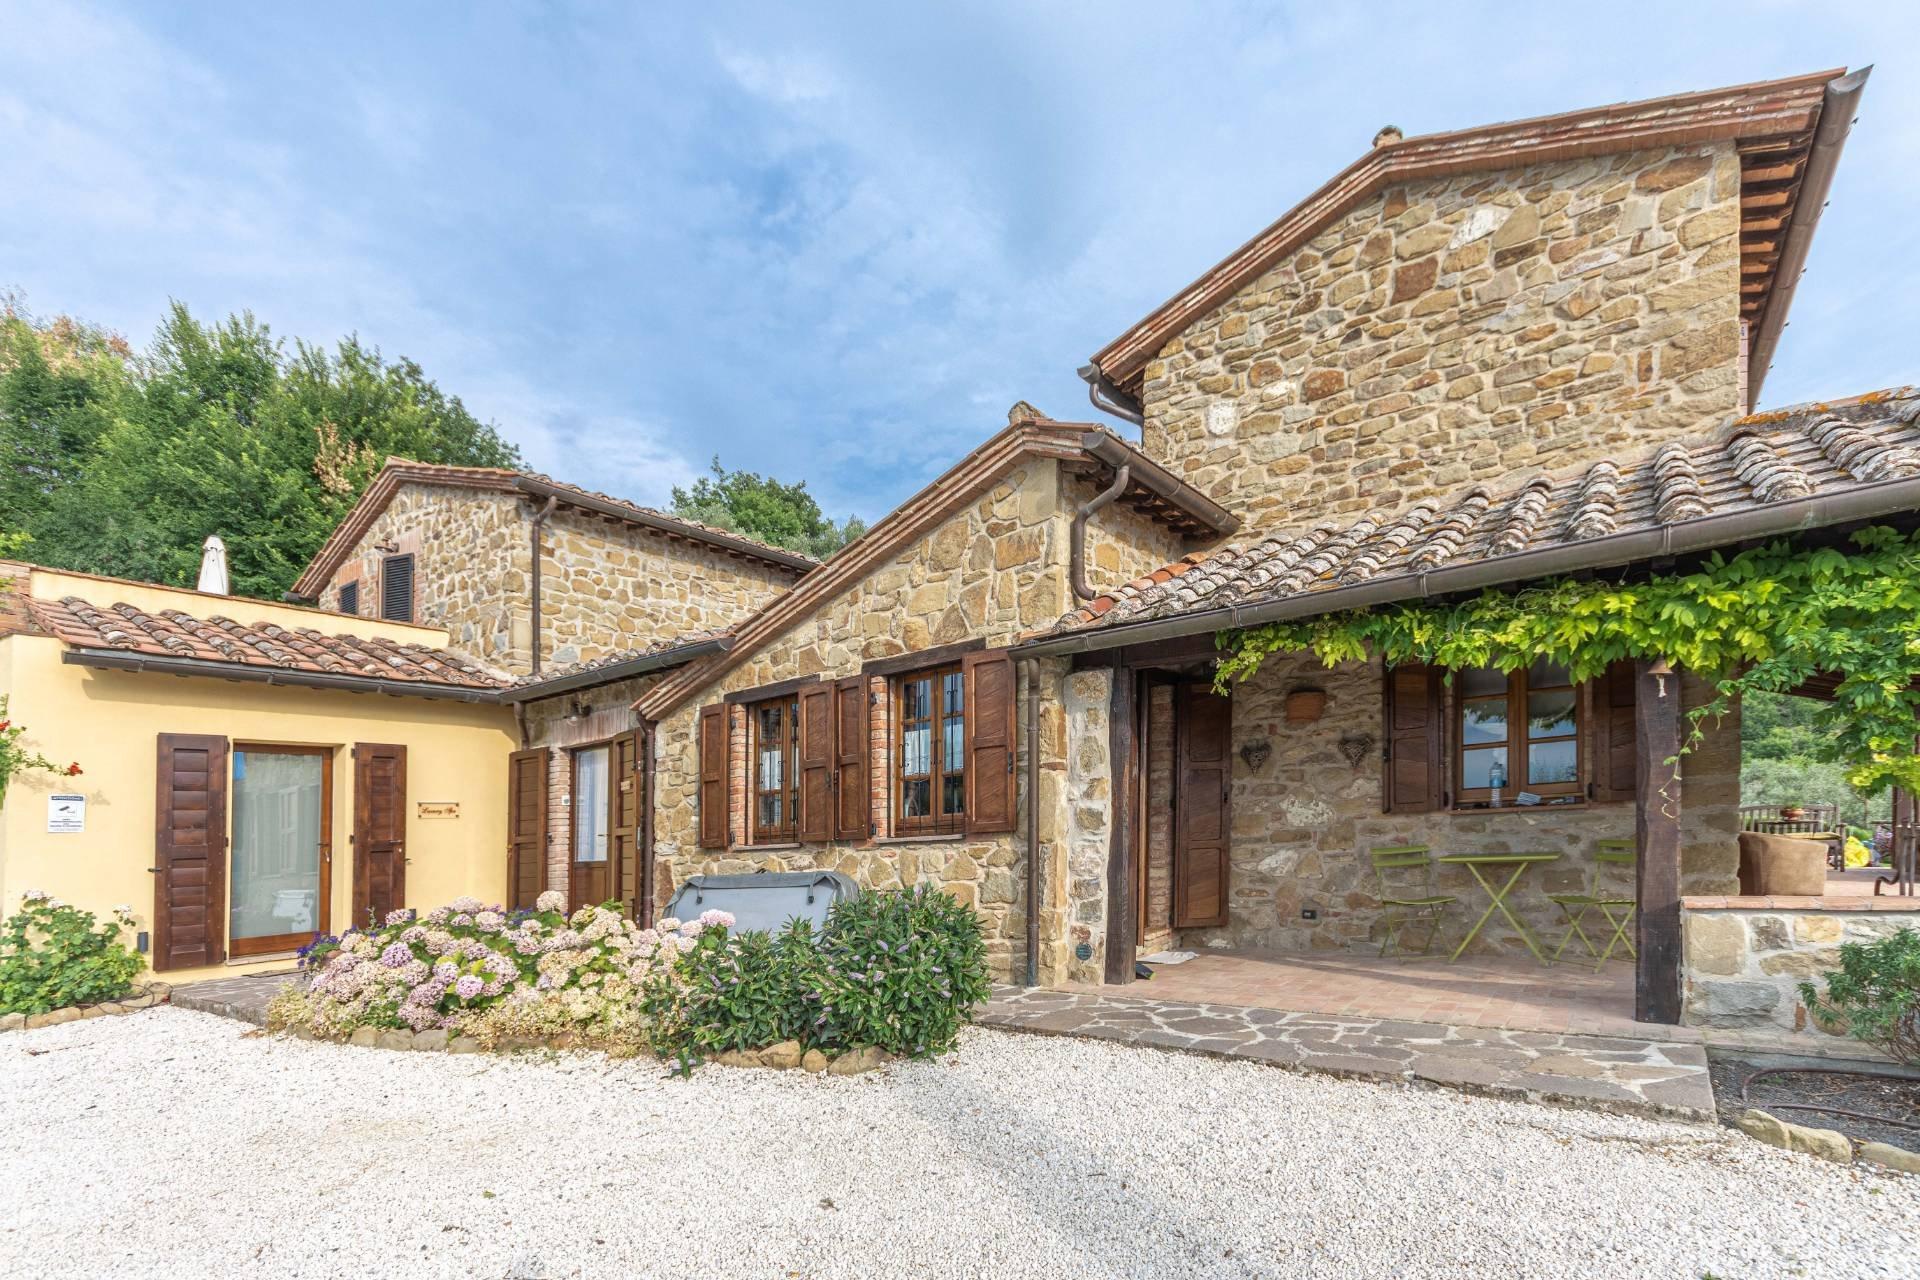 Farm Ranch in Umbria, Italy 1 - 10702422